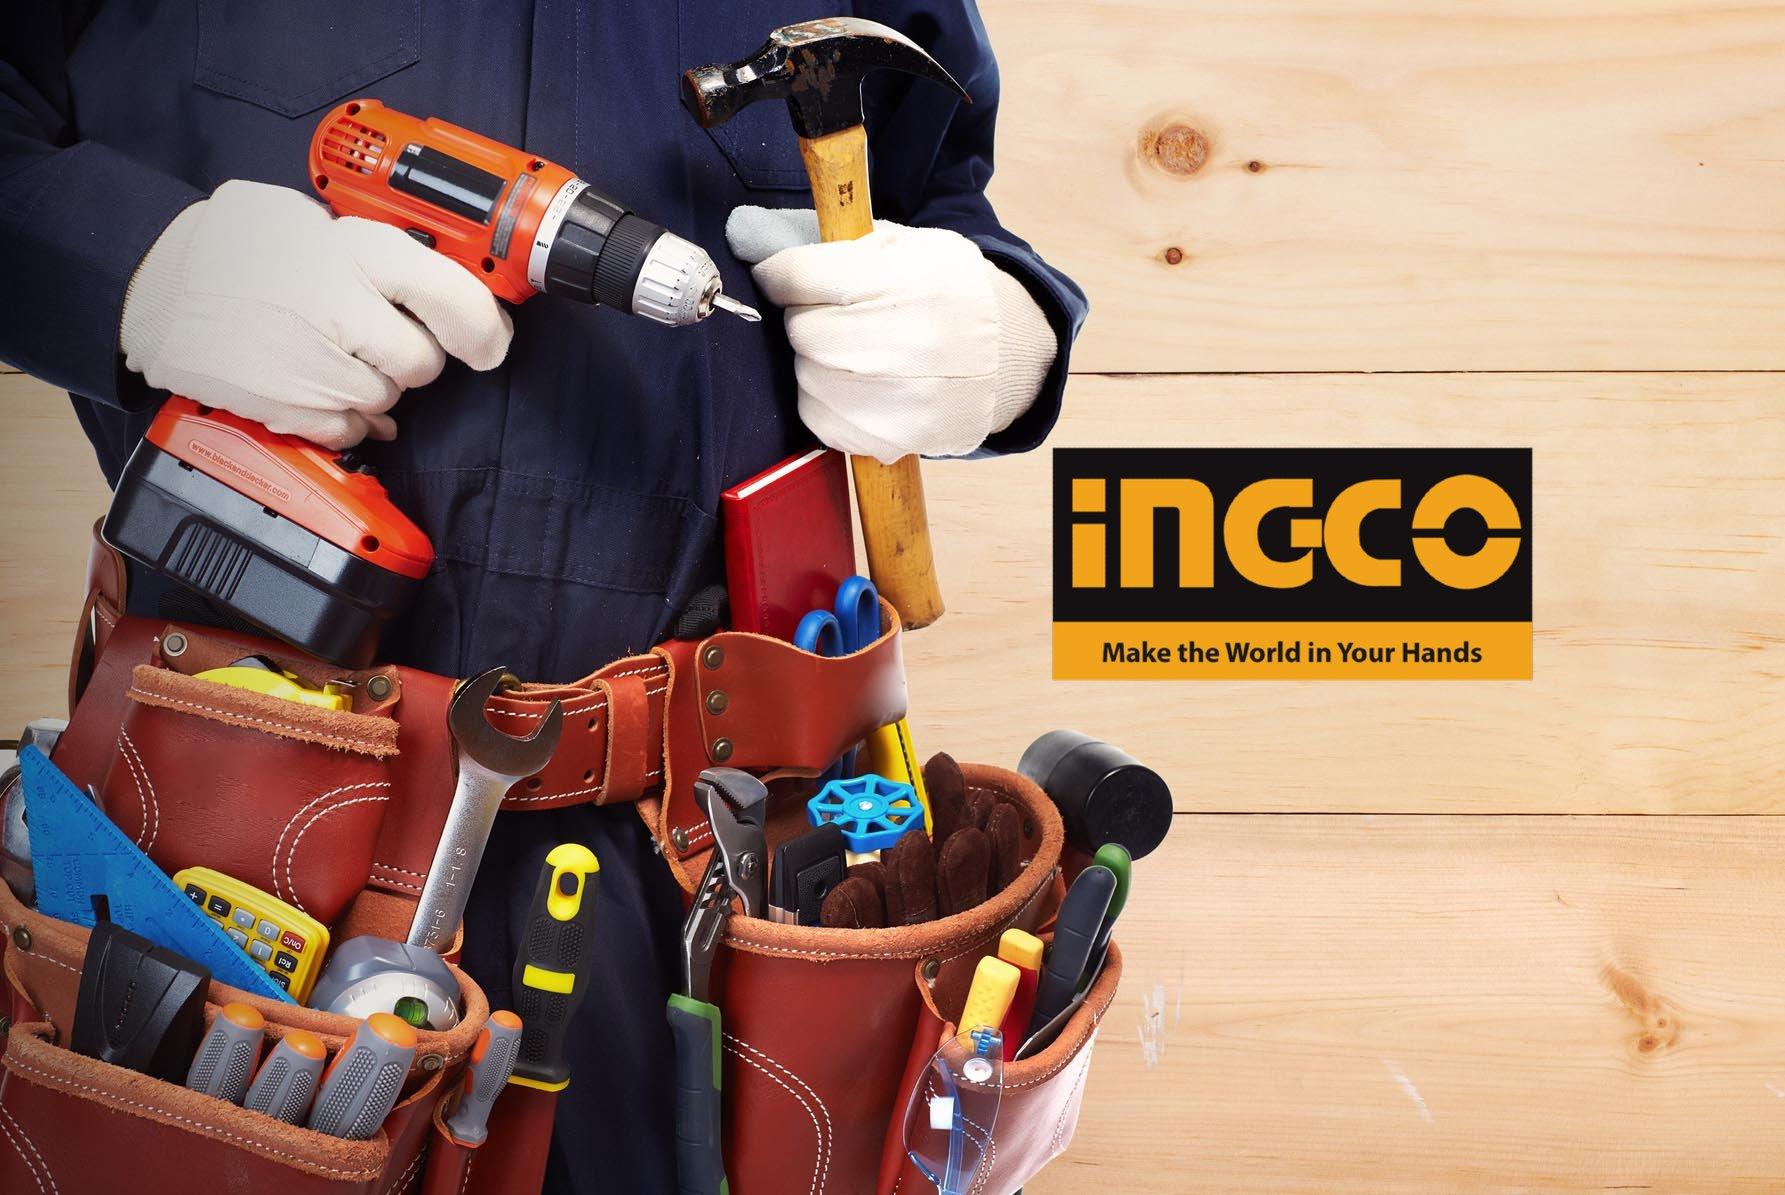 rellosgreen.gr slide image Σου αρέσει να επισκευάζεις μόνος σου ;  #home#tools Ανακάλυψε τώρα τη μεγάλη γκάμα ηλεκτρικών εργαλείων αλλά και εργαλείων χειρός και βρες αυτό που χρειάζεσαι